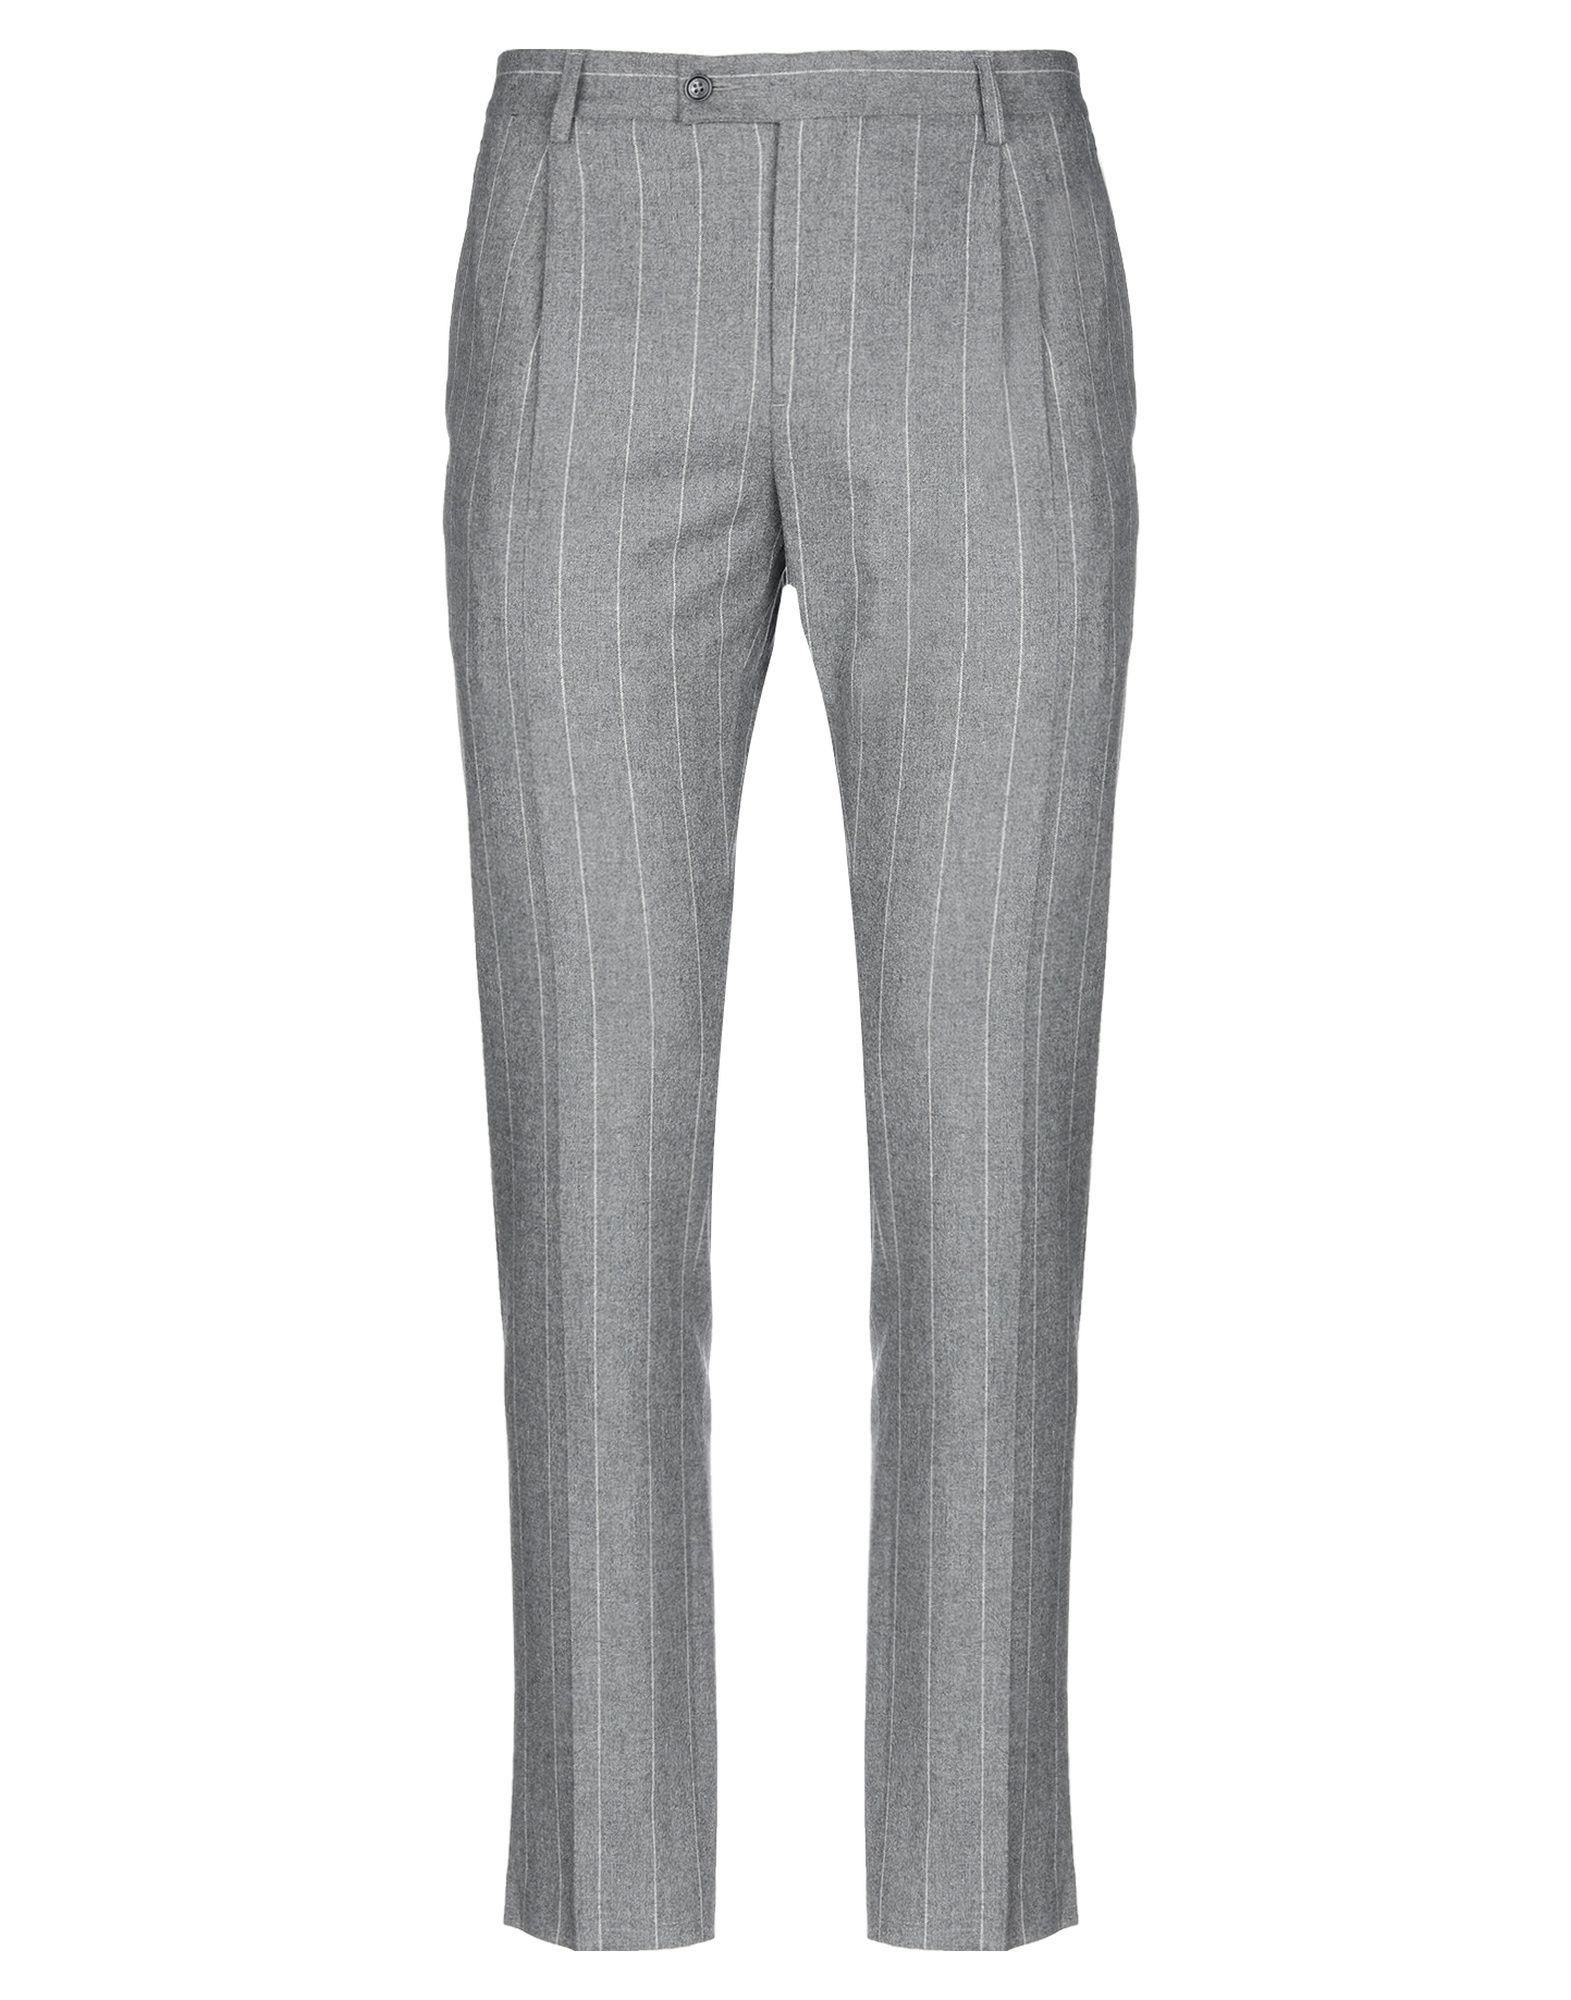 Pantalone grigio Daniele Daniele Daniele Alessandrini uomo - 13346570EM caa